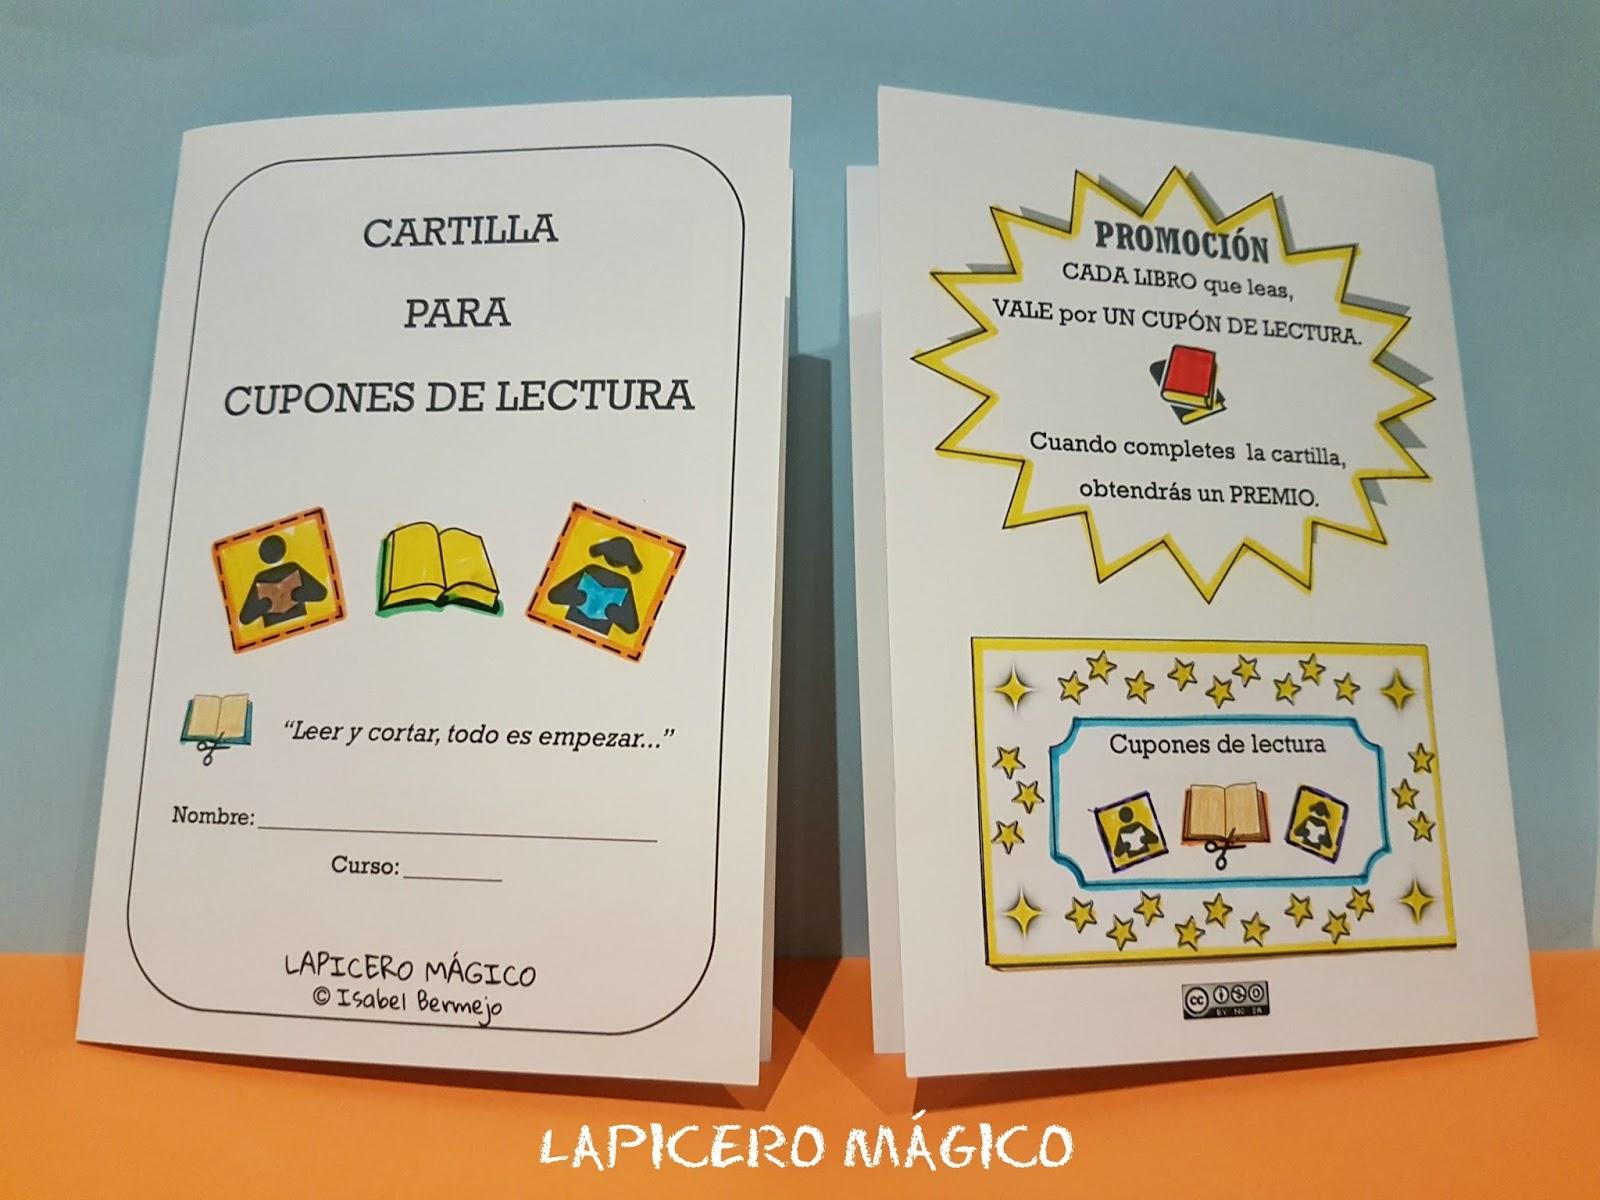 Cartilla De Lectura Infantil: LAPICERO MÁGICO: Cartilla Para Cupones De Lectura